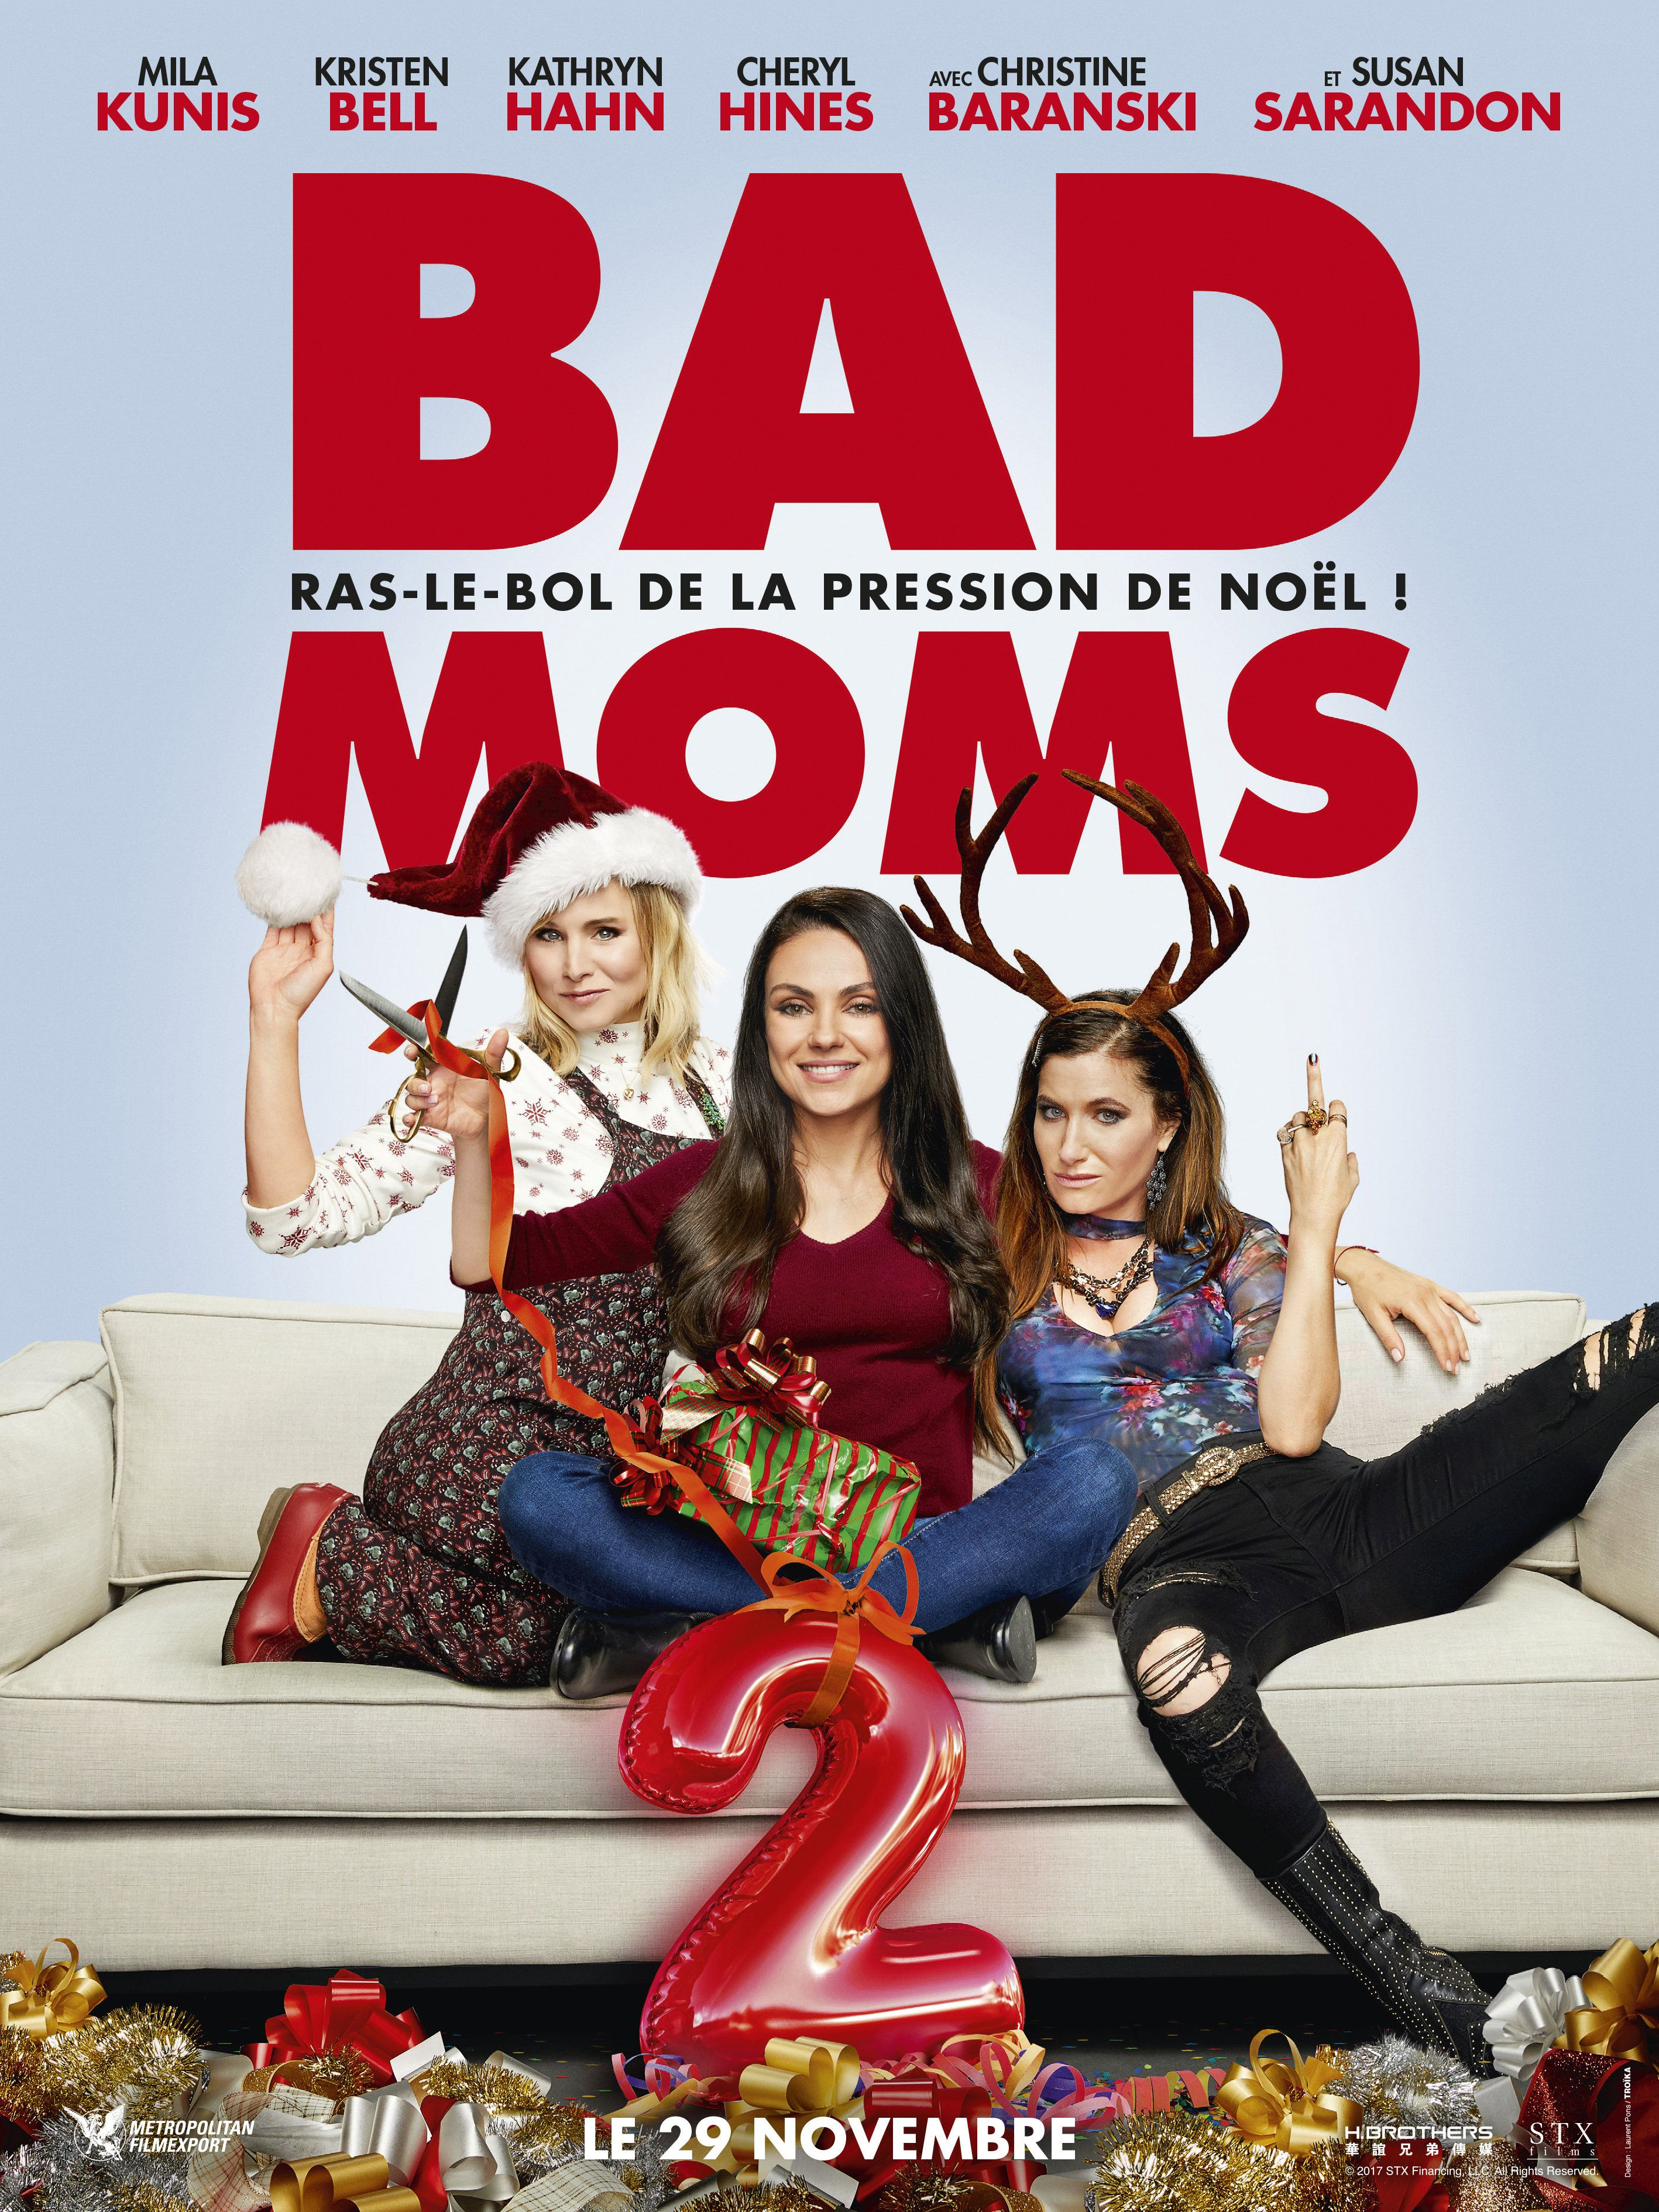 Bad Moms 2 Jon Lucas Scott Moore 2017 Movies Christmas